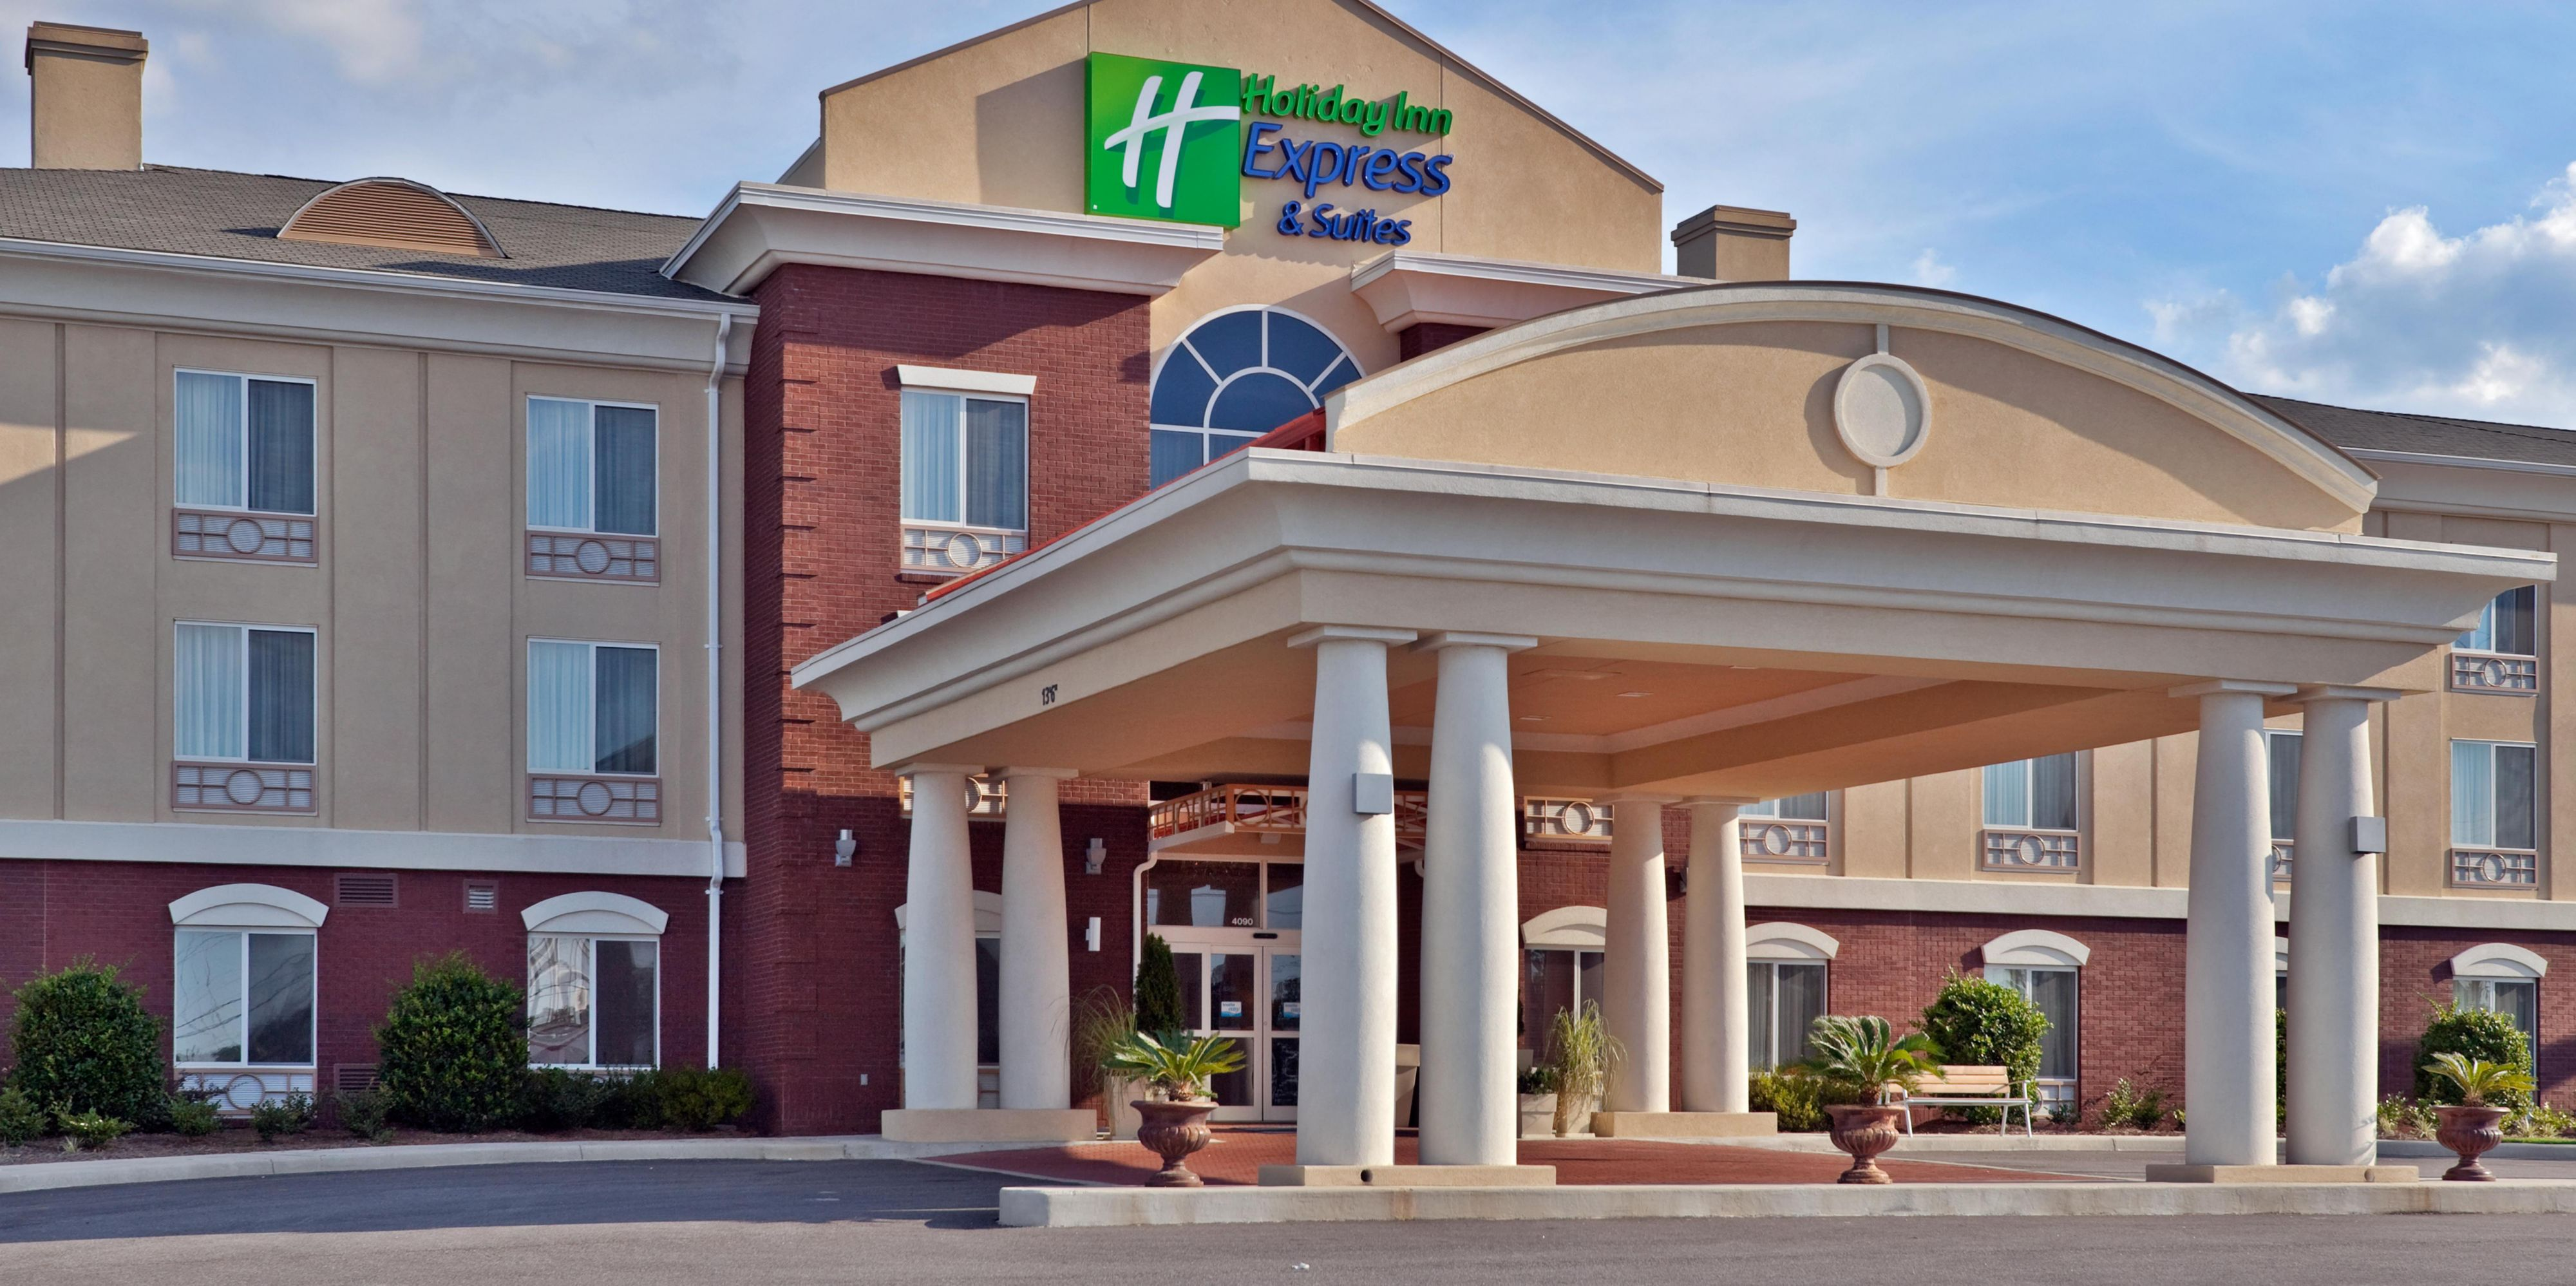 Enterprise Hotels: Candlewood Suites Enterprise - Extended Stay ...